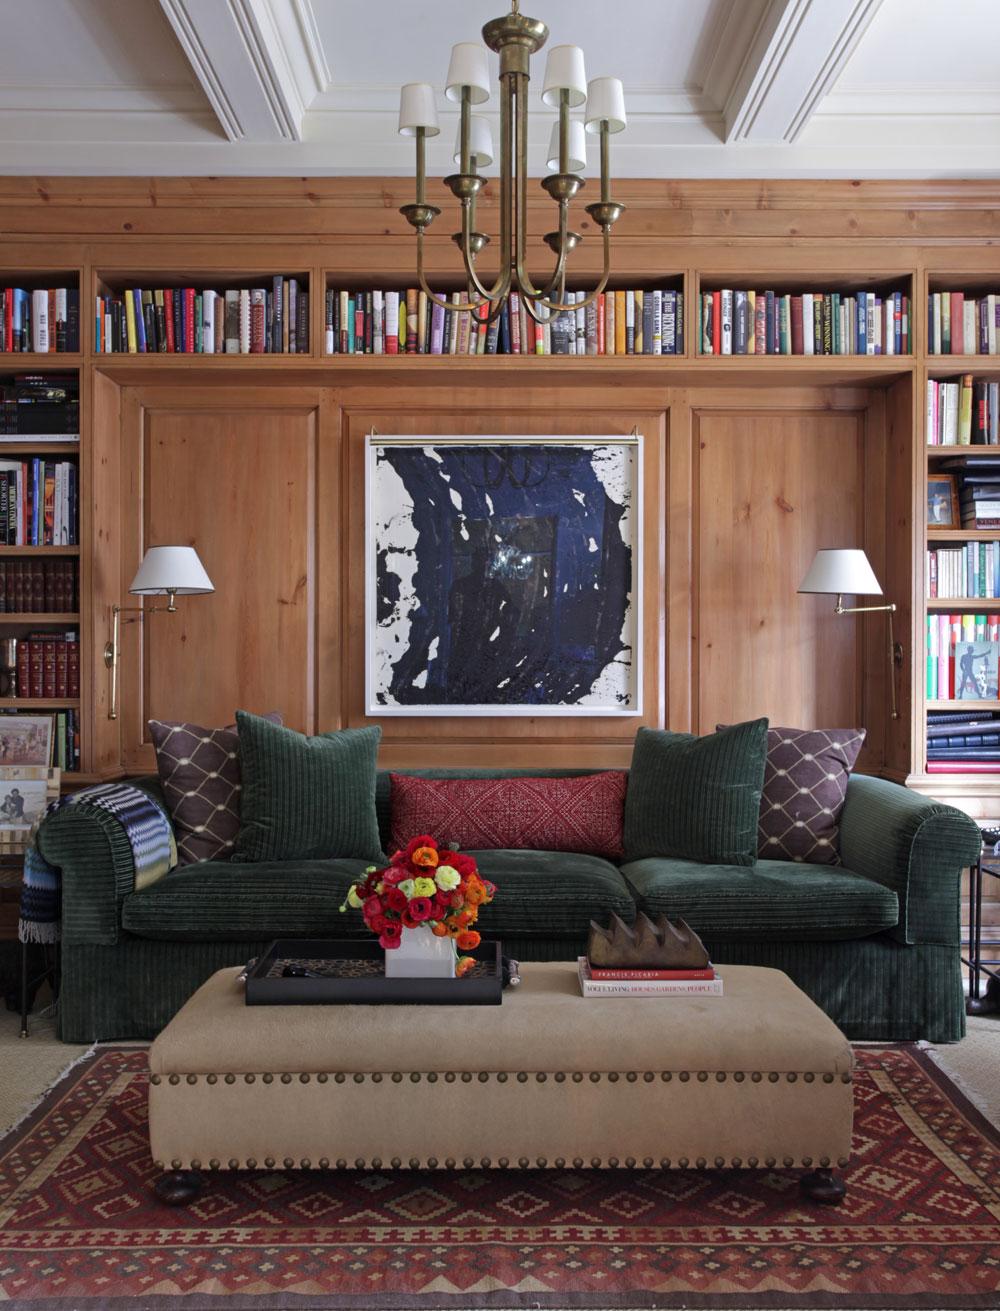 Interior design by Timothy Whealon Inc.